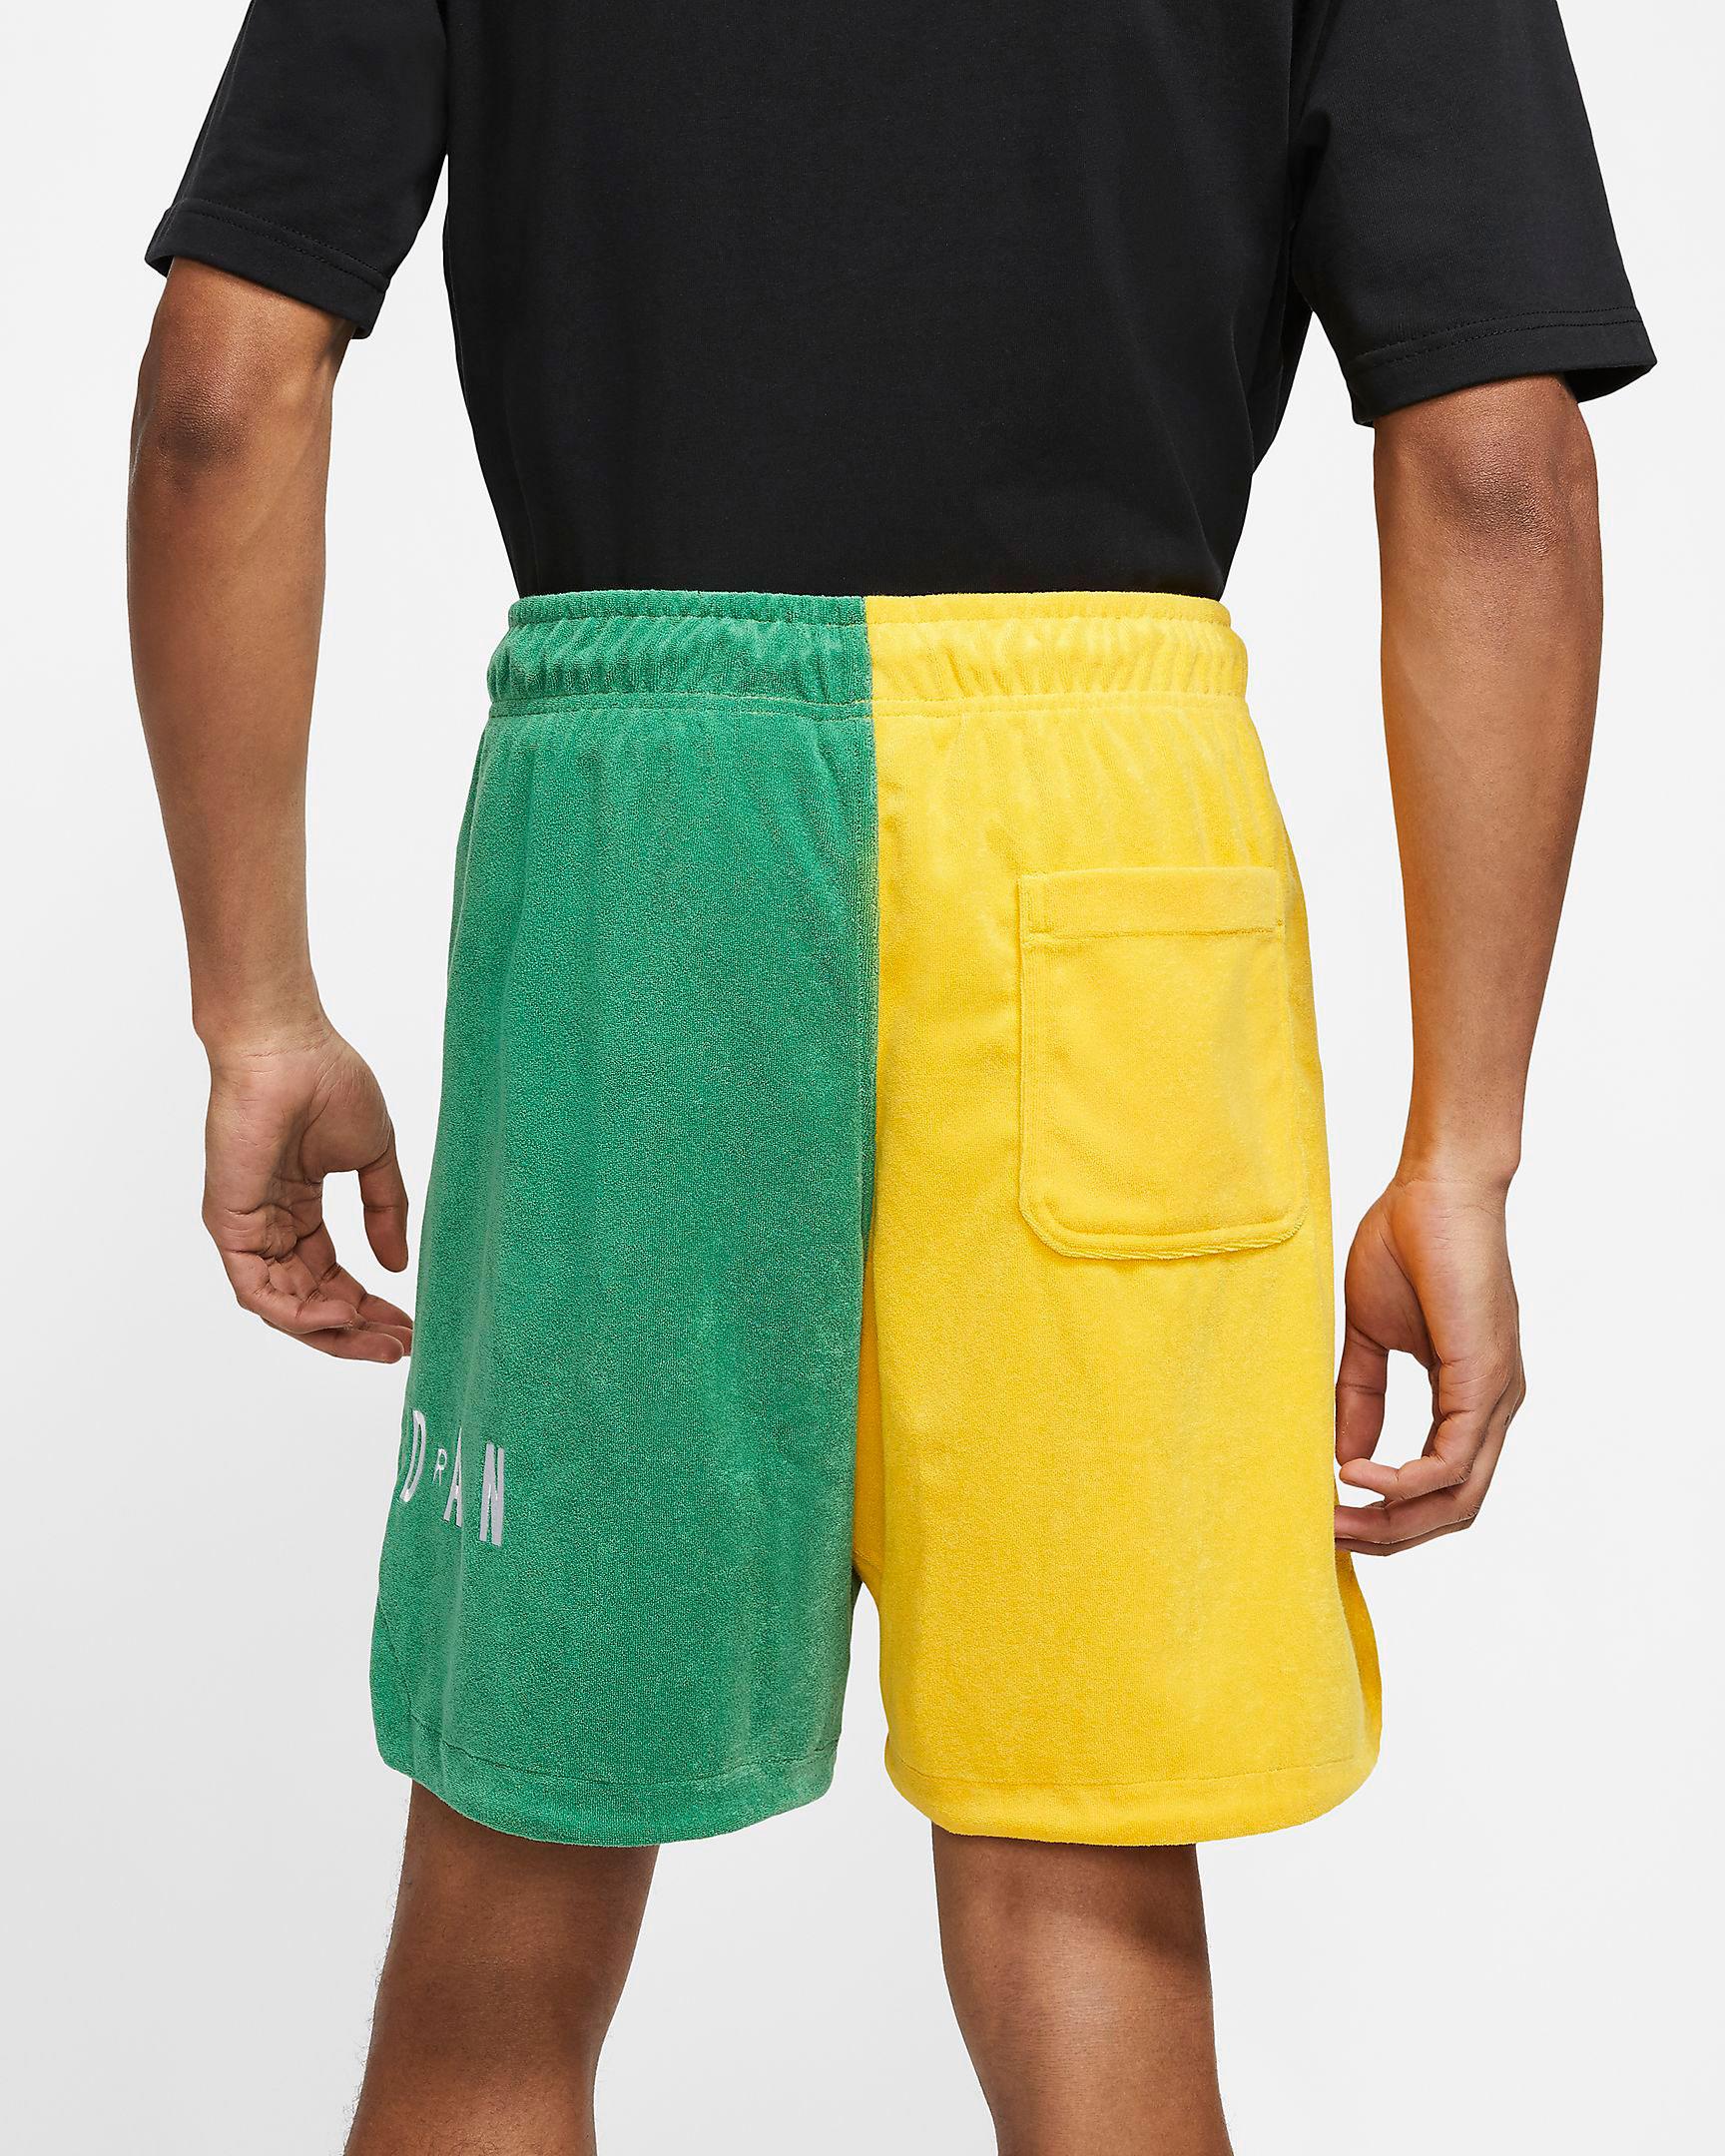 nike-dunk-low-brazil-shorts-match-3